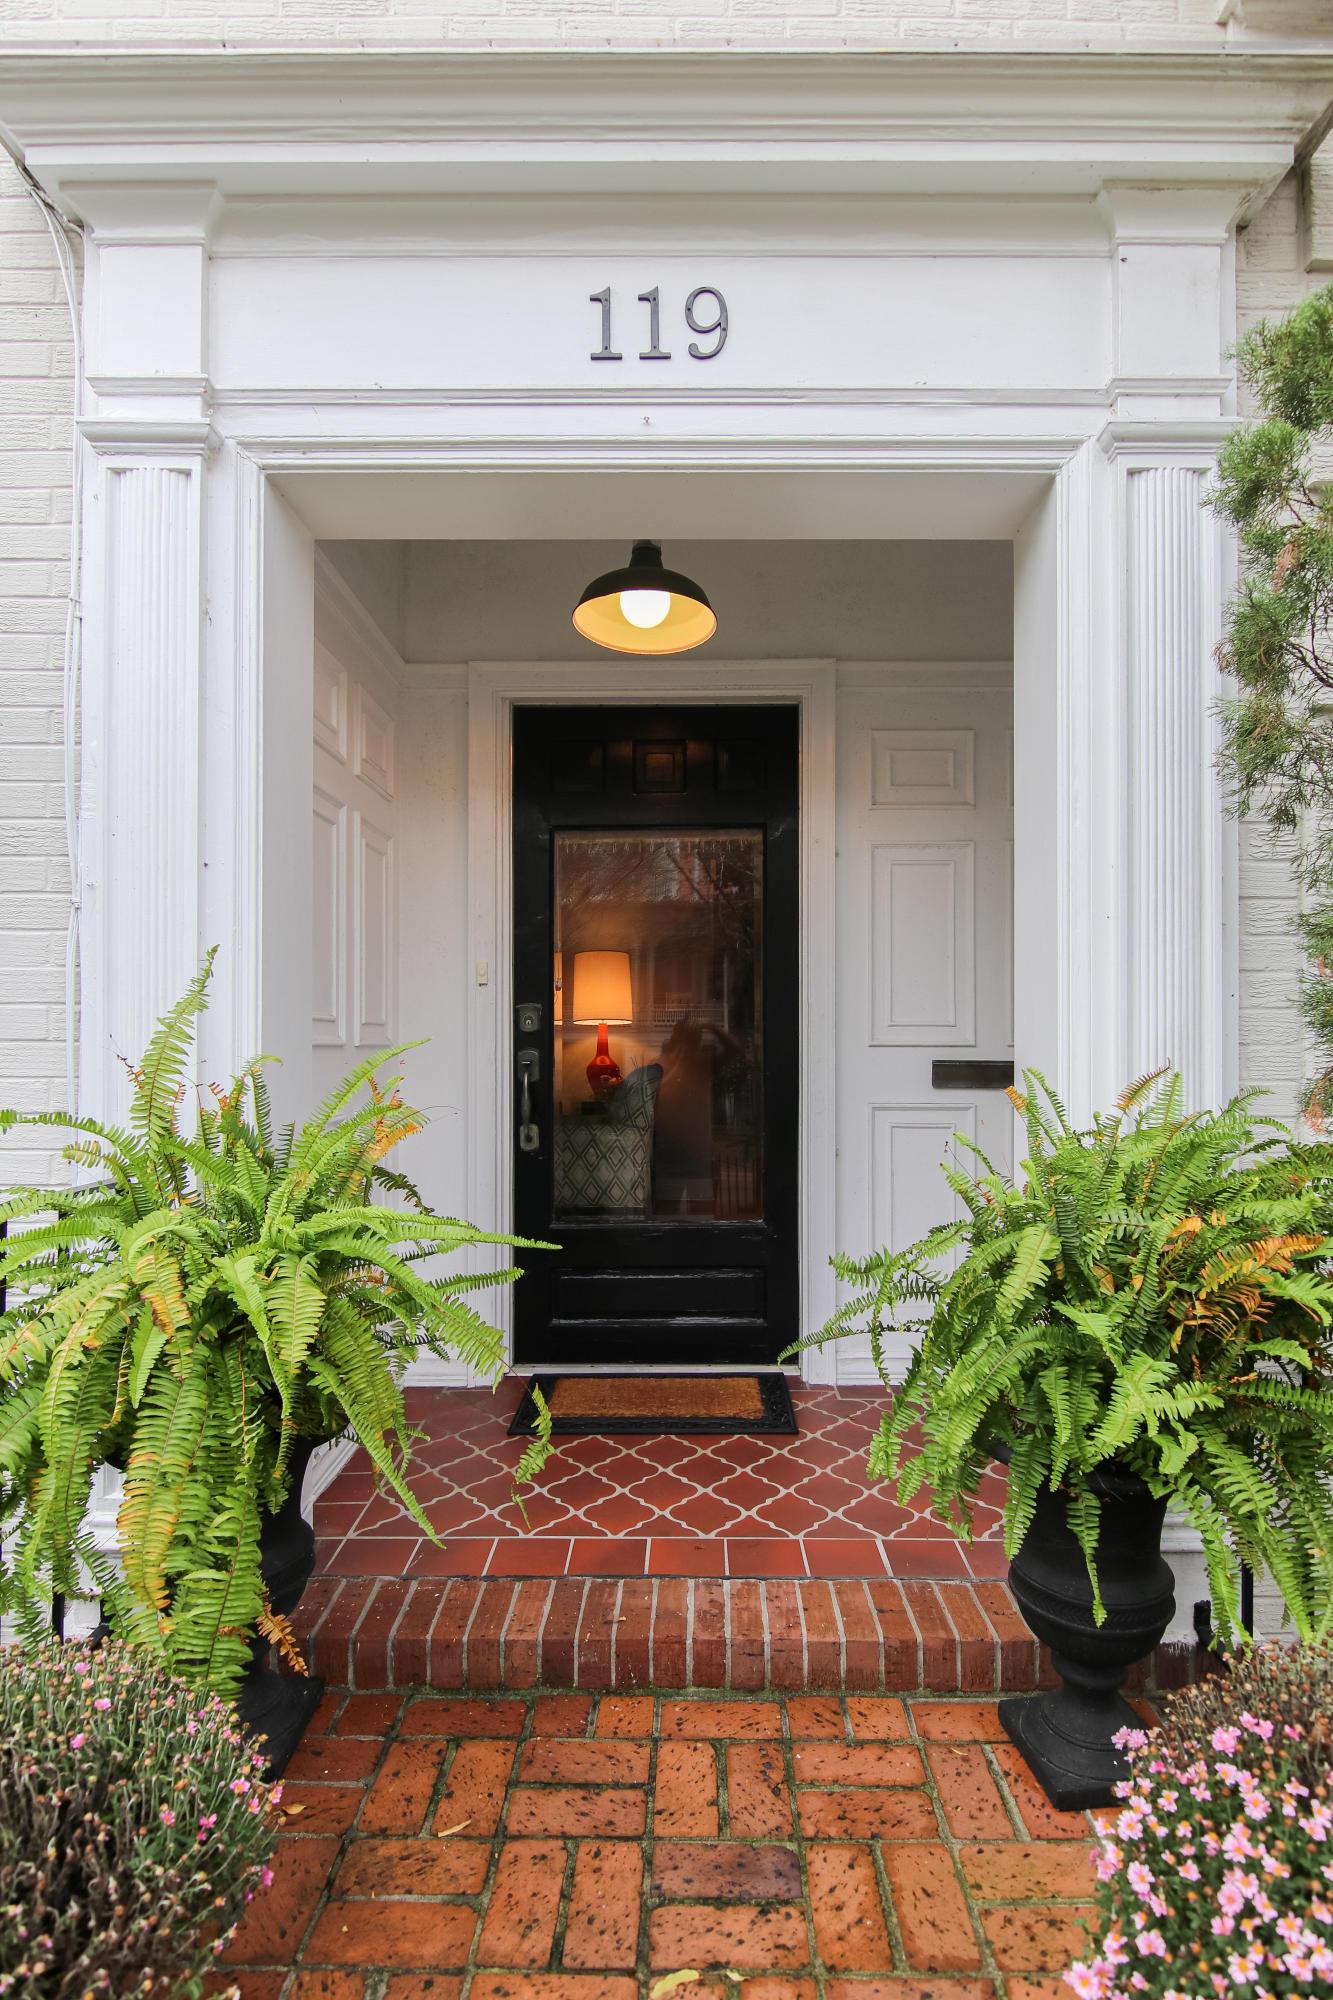 Harleston Village Homes For Sale - 119 Rutledge, Charleston, SC - 25